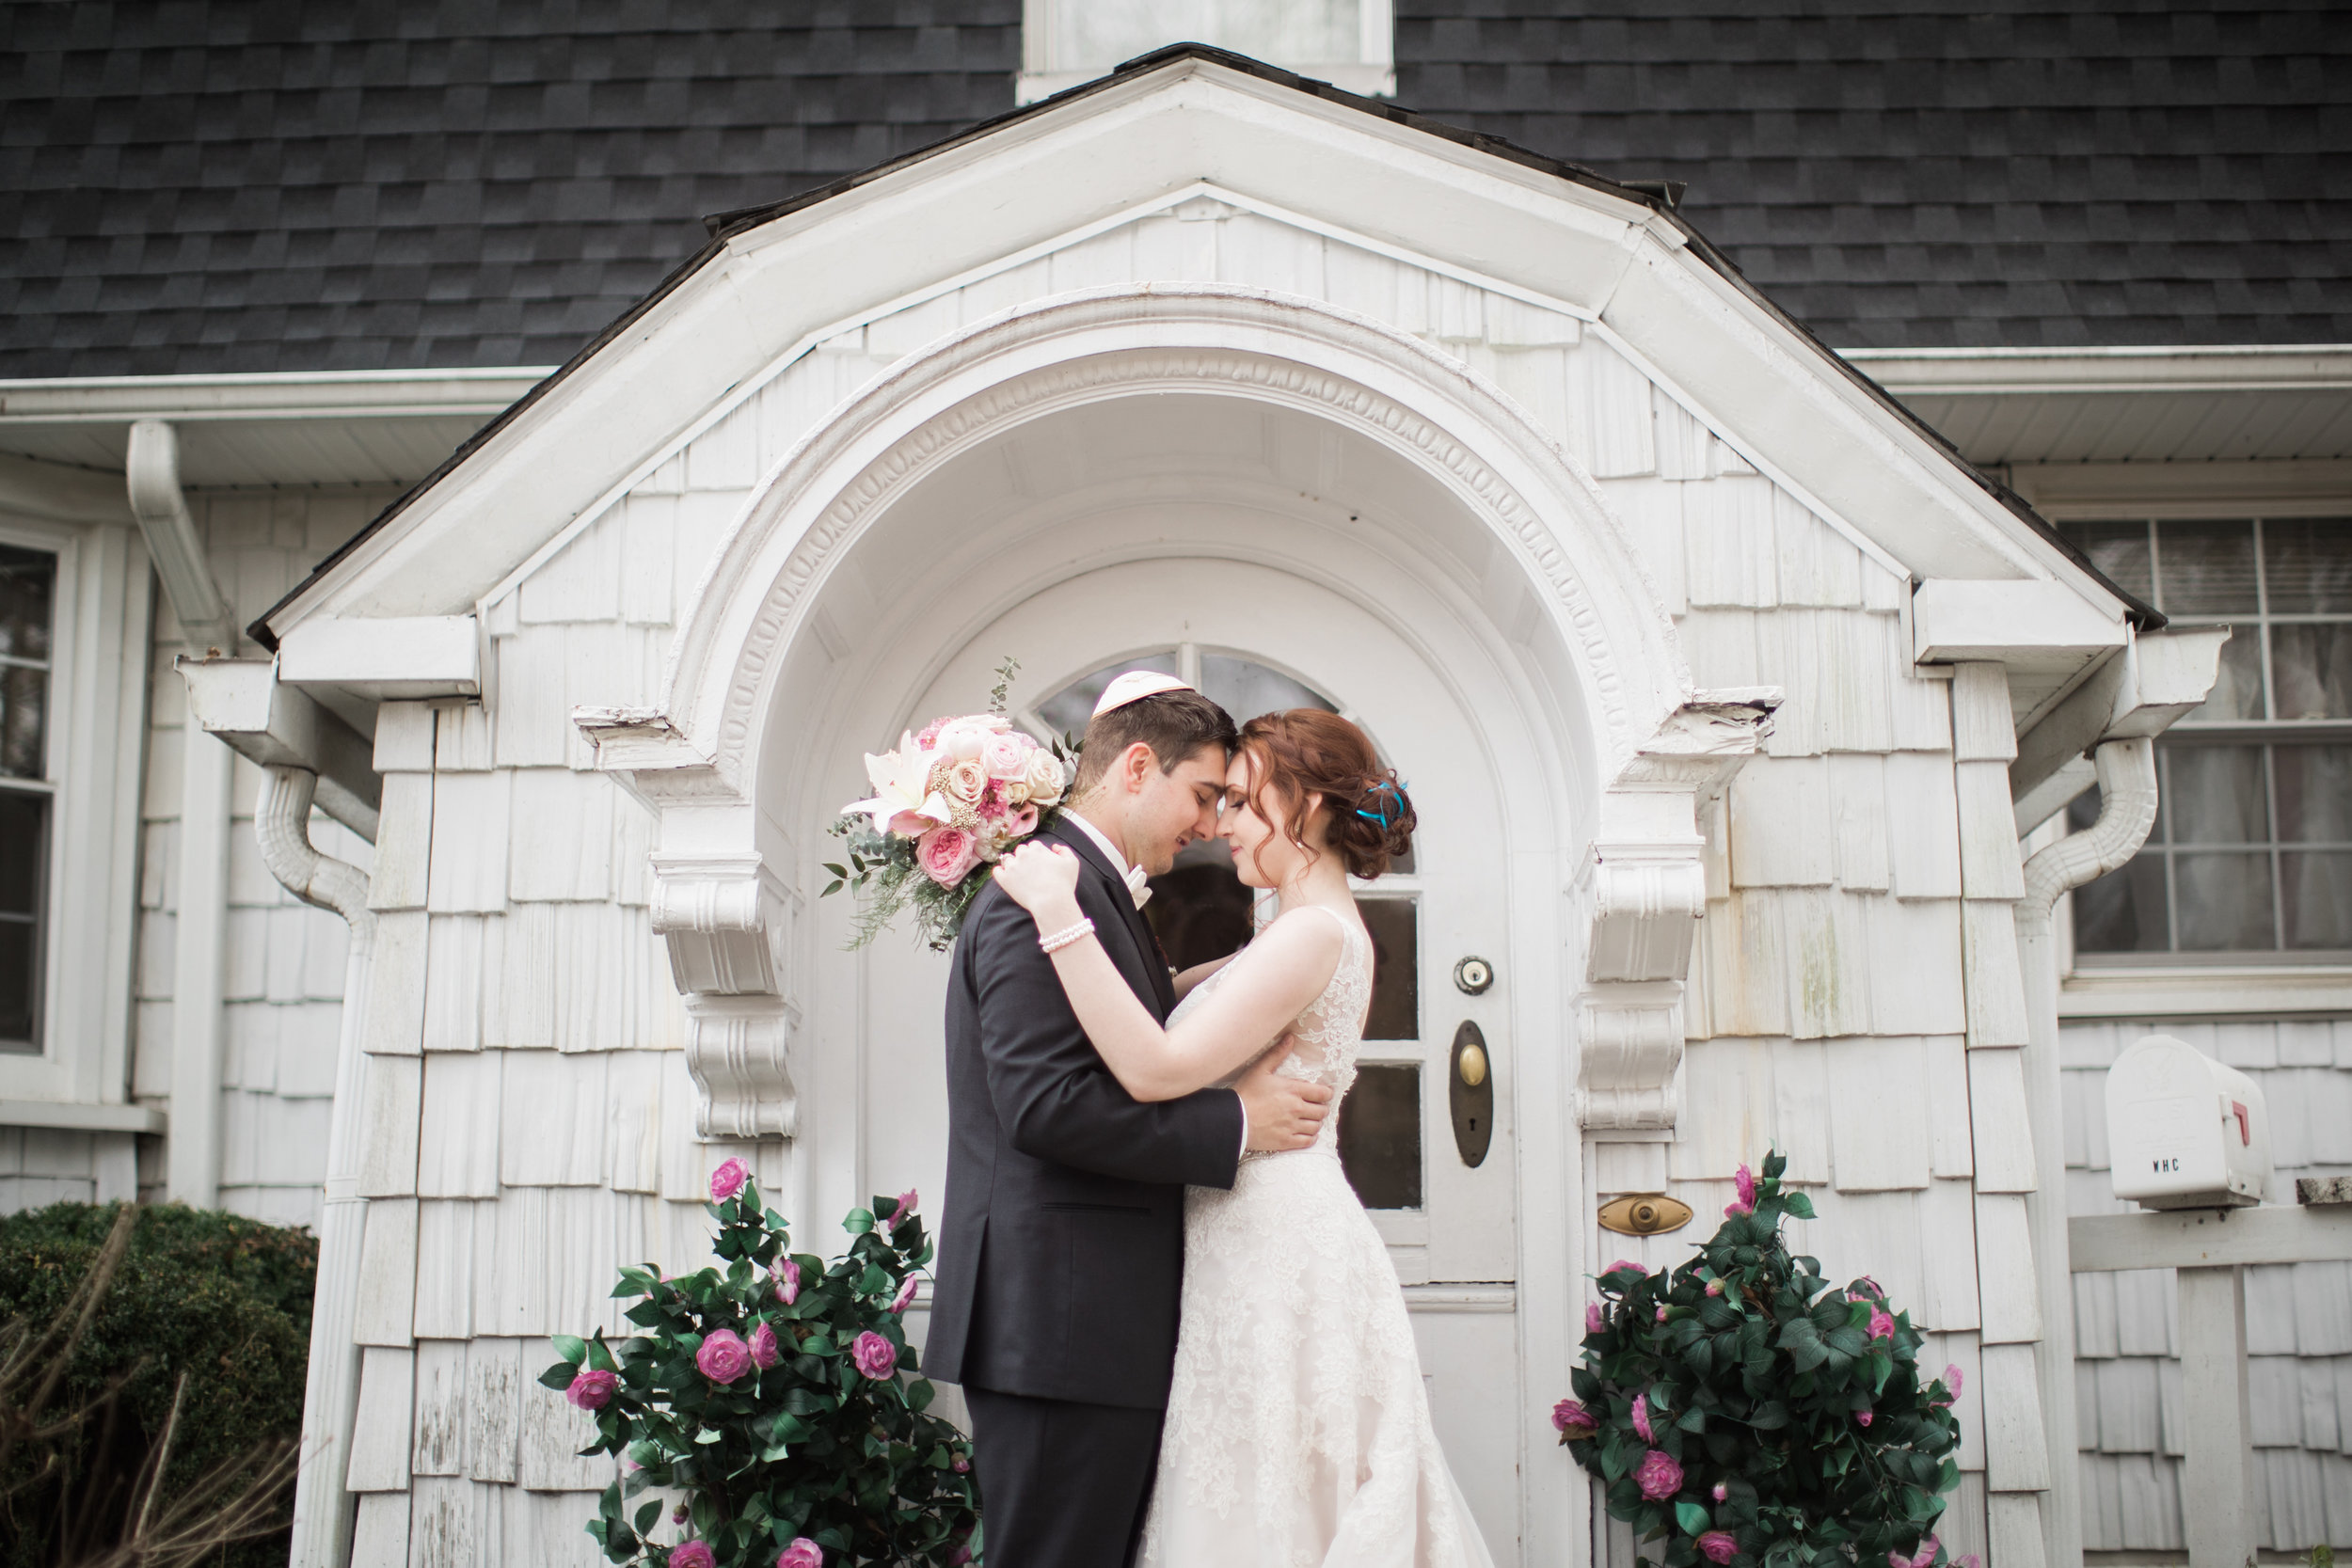 Harry Potter Wedding at Overhills Mansion Catonville Maryland Wedding Photographers Megapixels Media (41 of 134).jpg